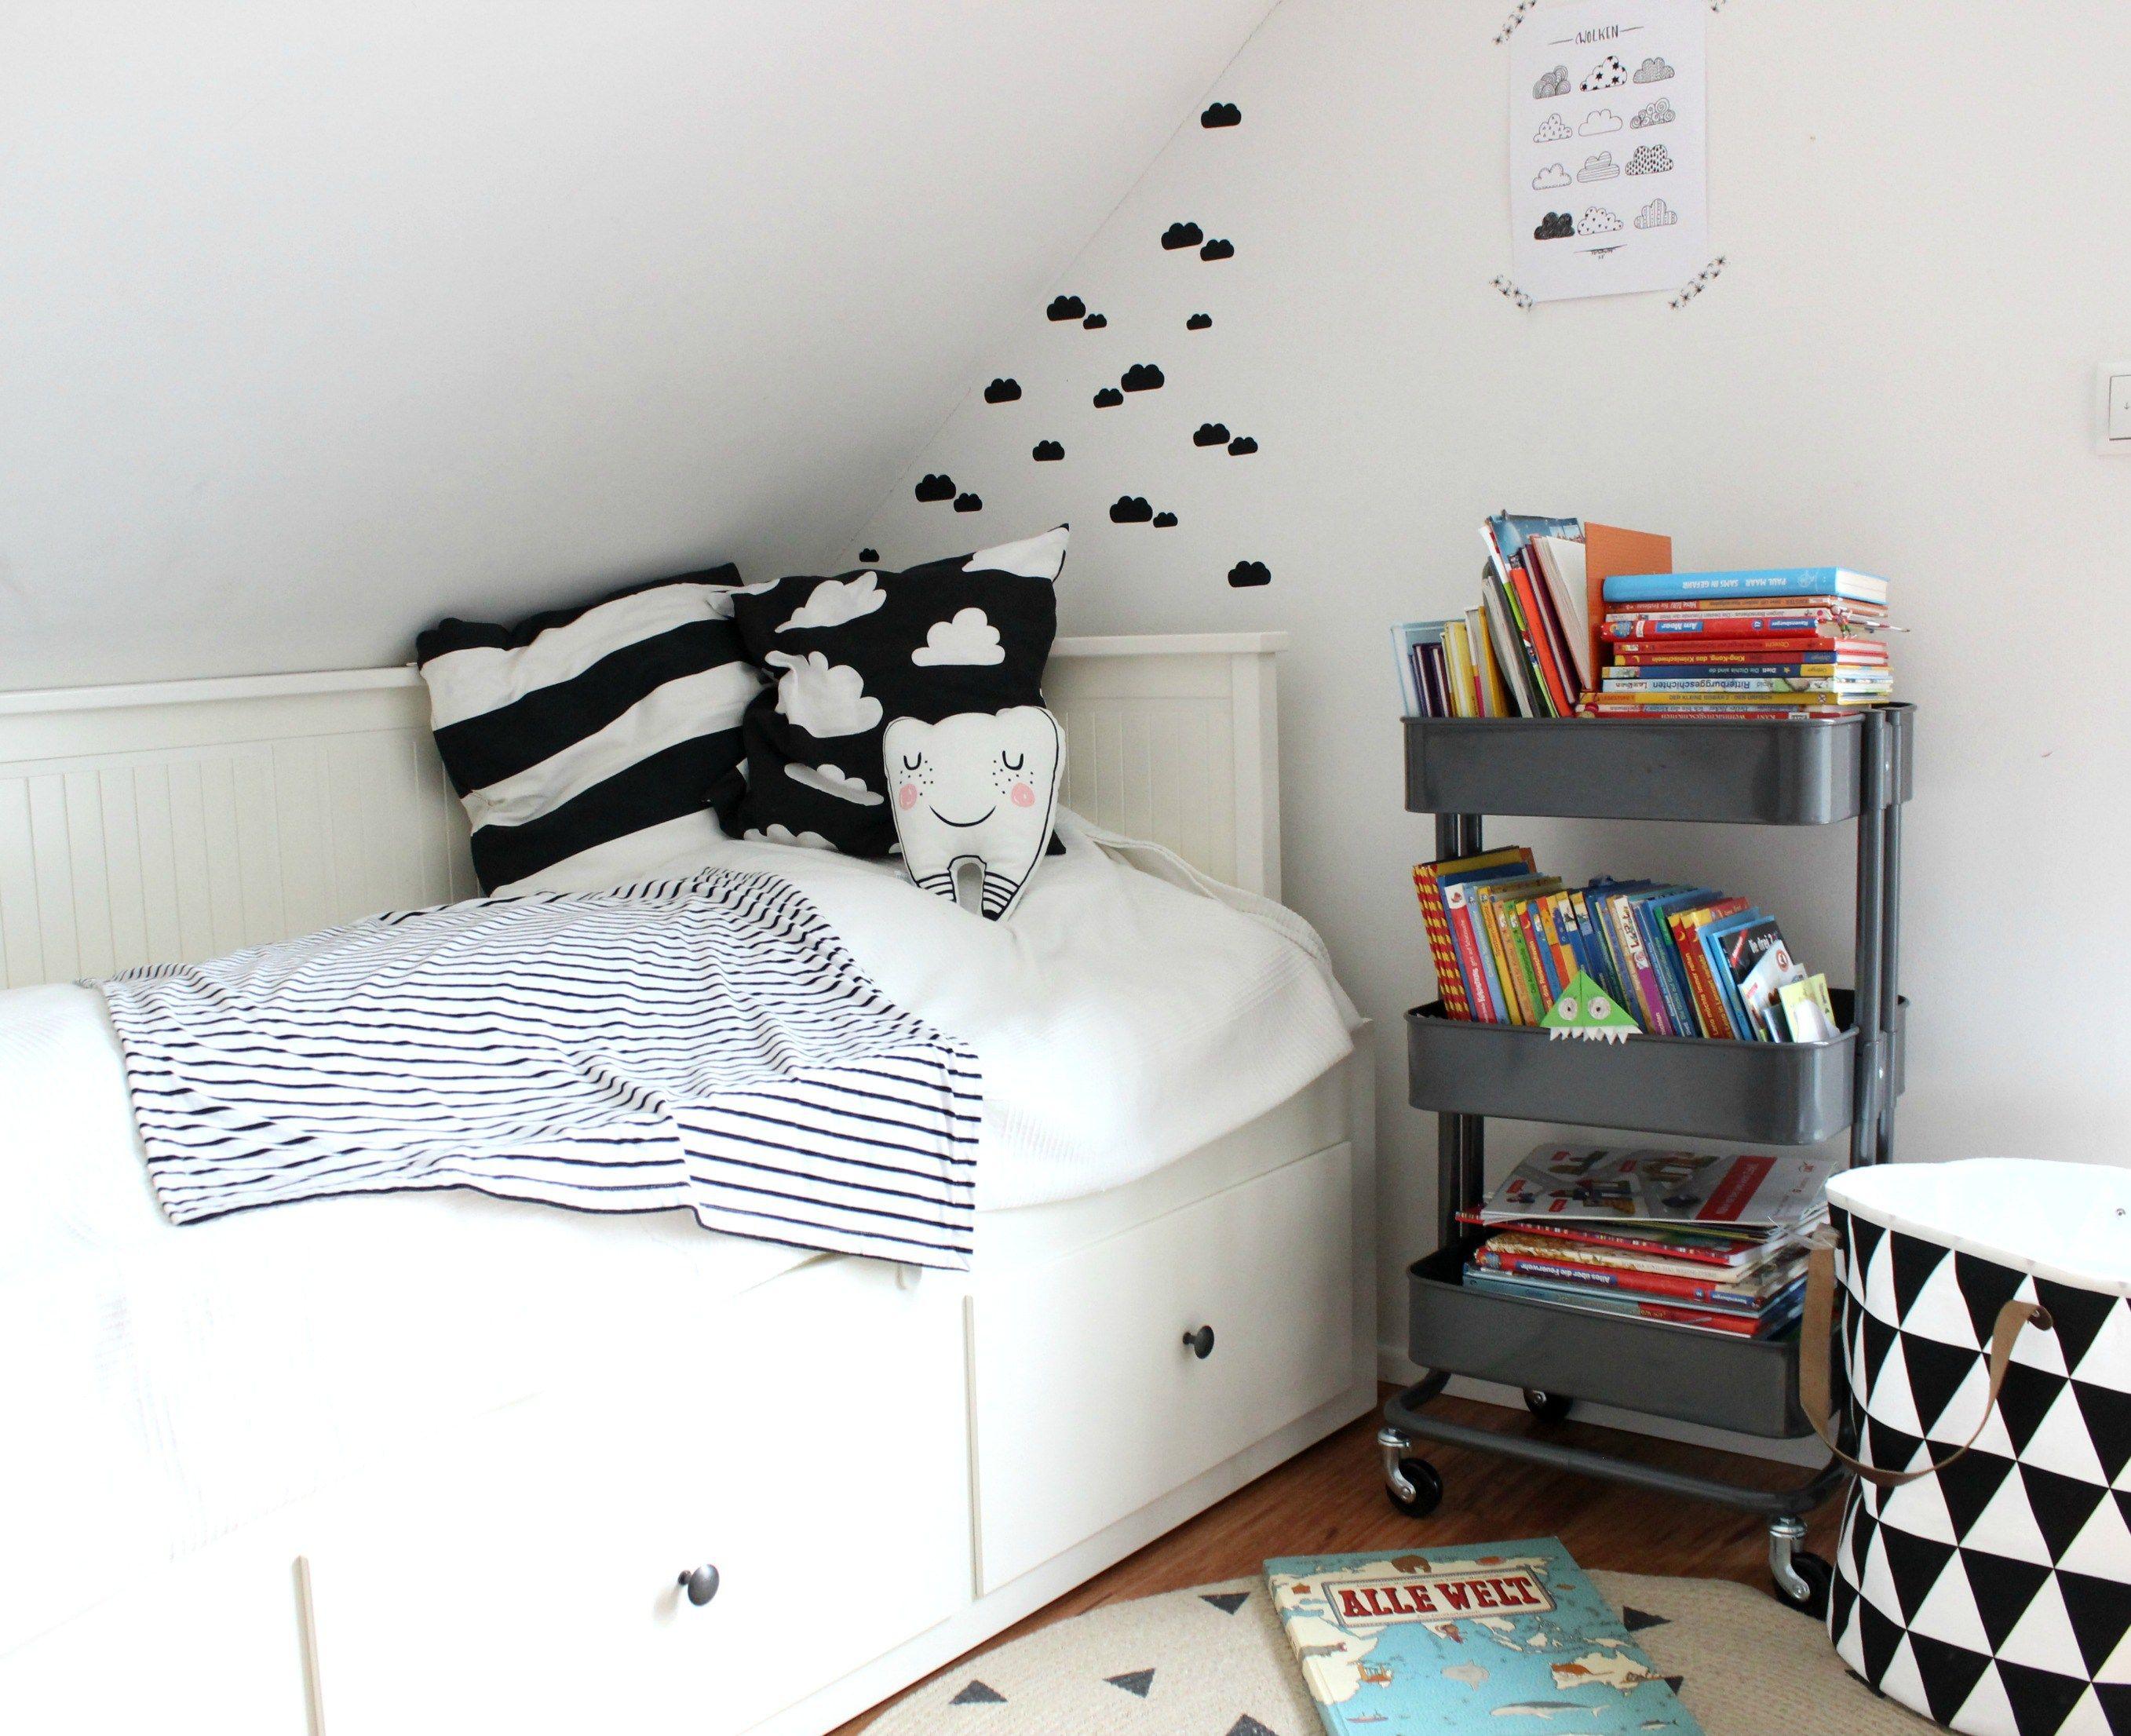 Kinderzimmer Vertbaudet ~ Hausregal herbst winter vertbaudet kids rooms